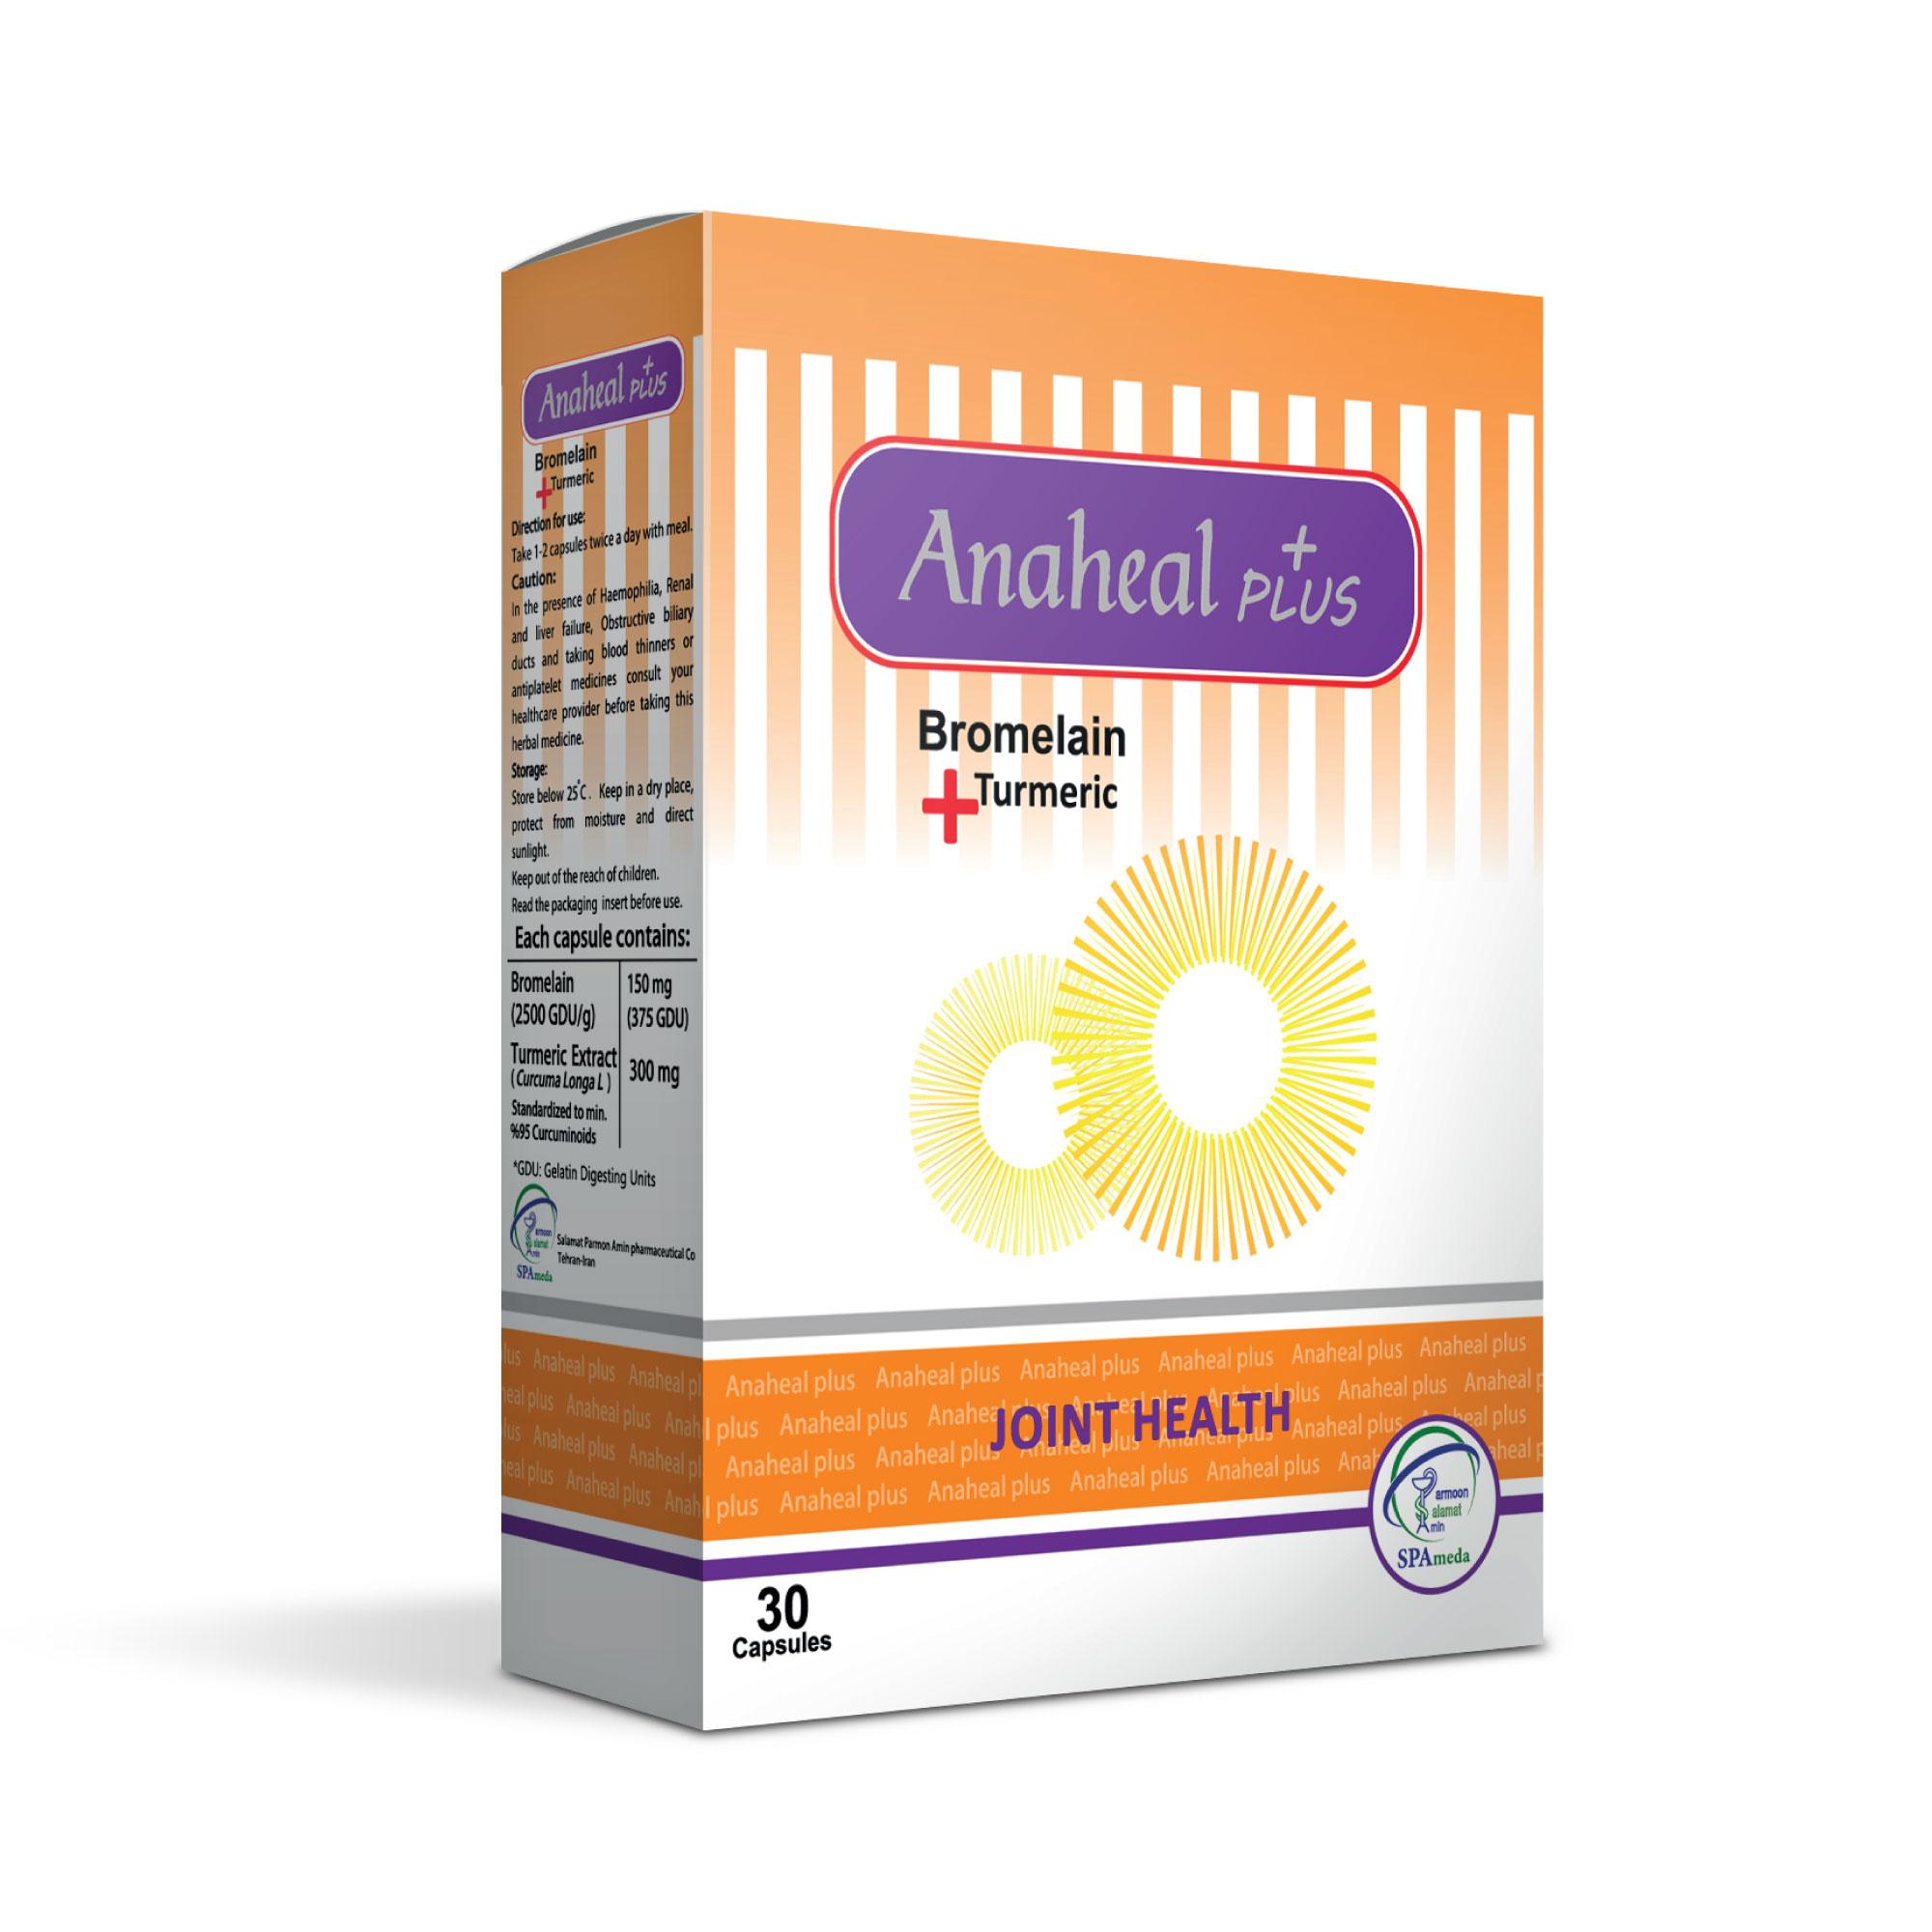 anahealplus